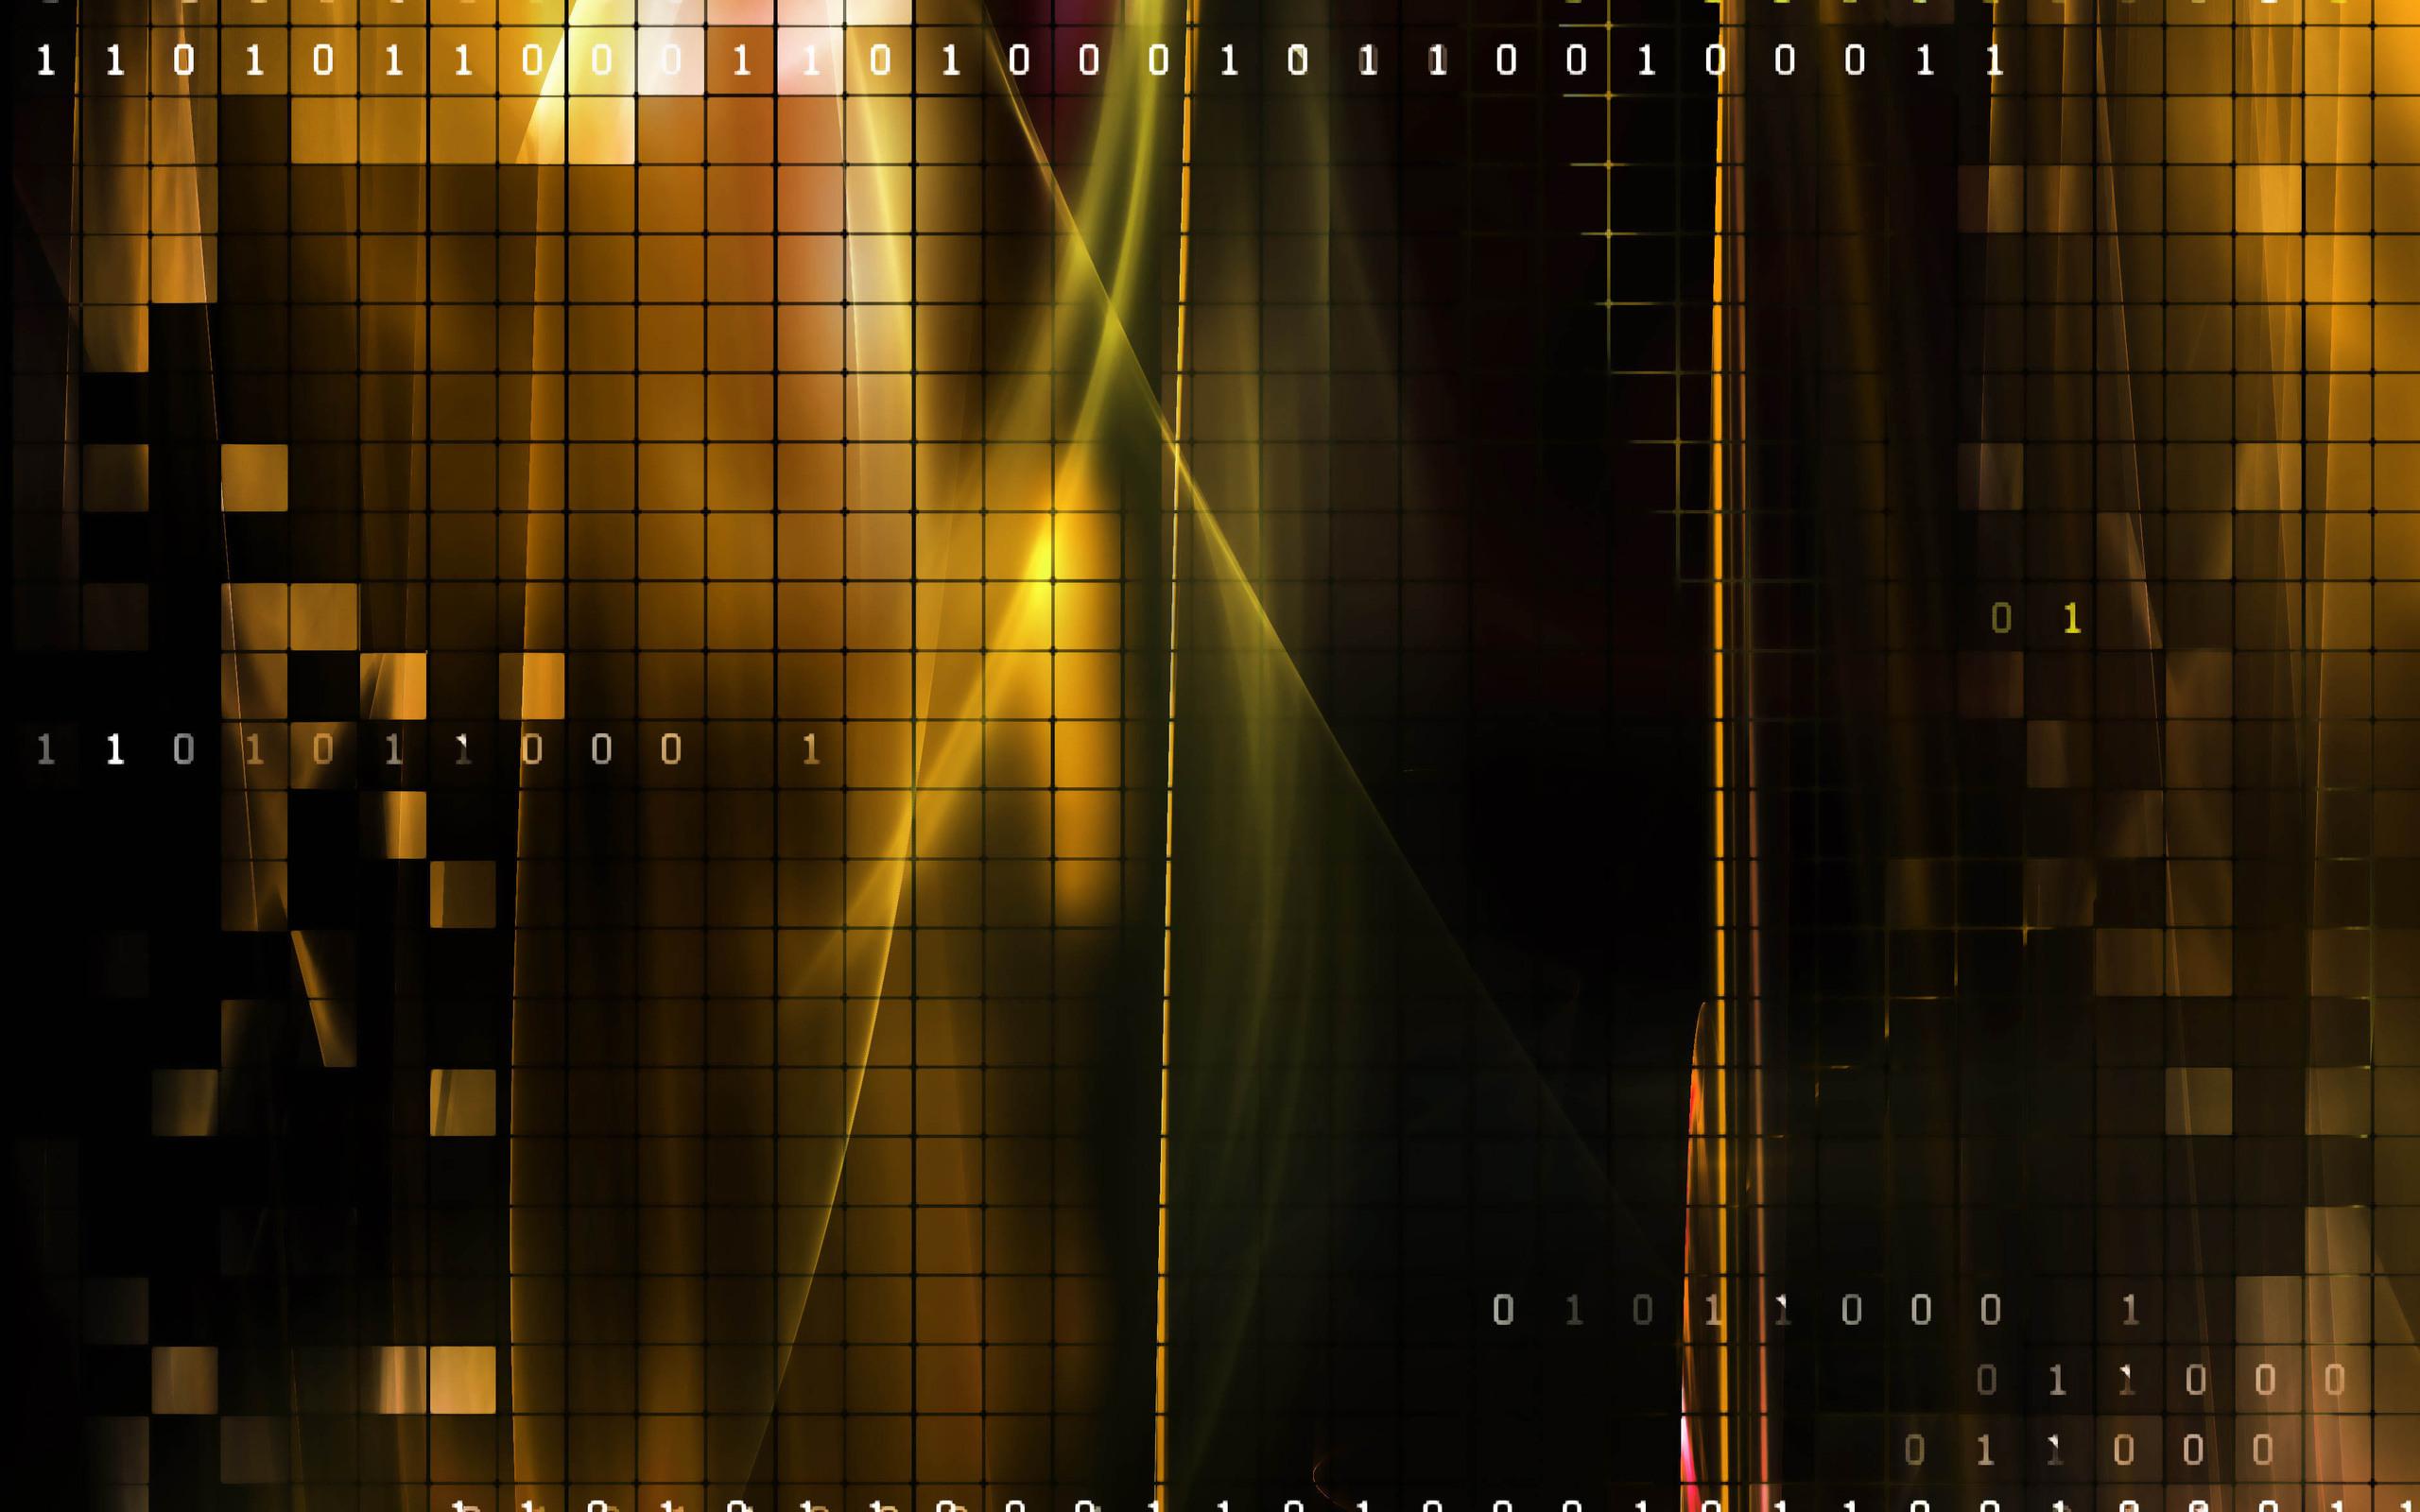 Technology Background Laptop: Artistic HD Wallpaper